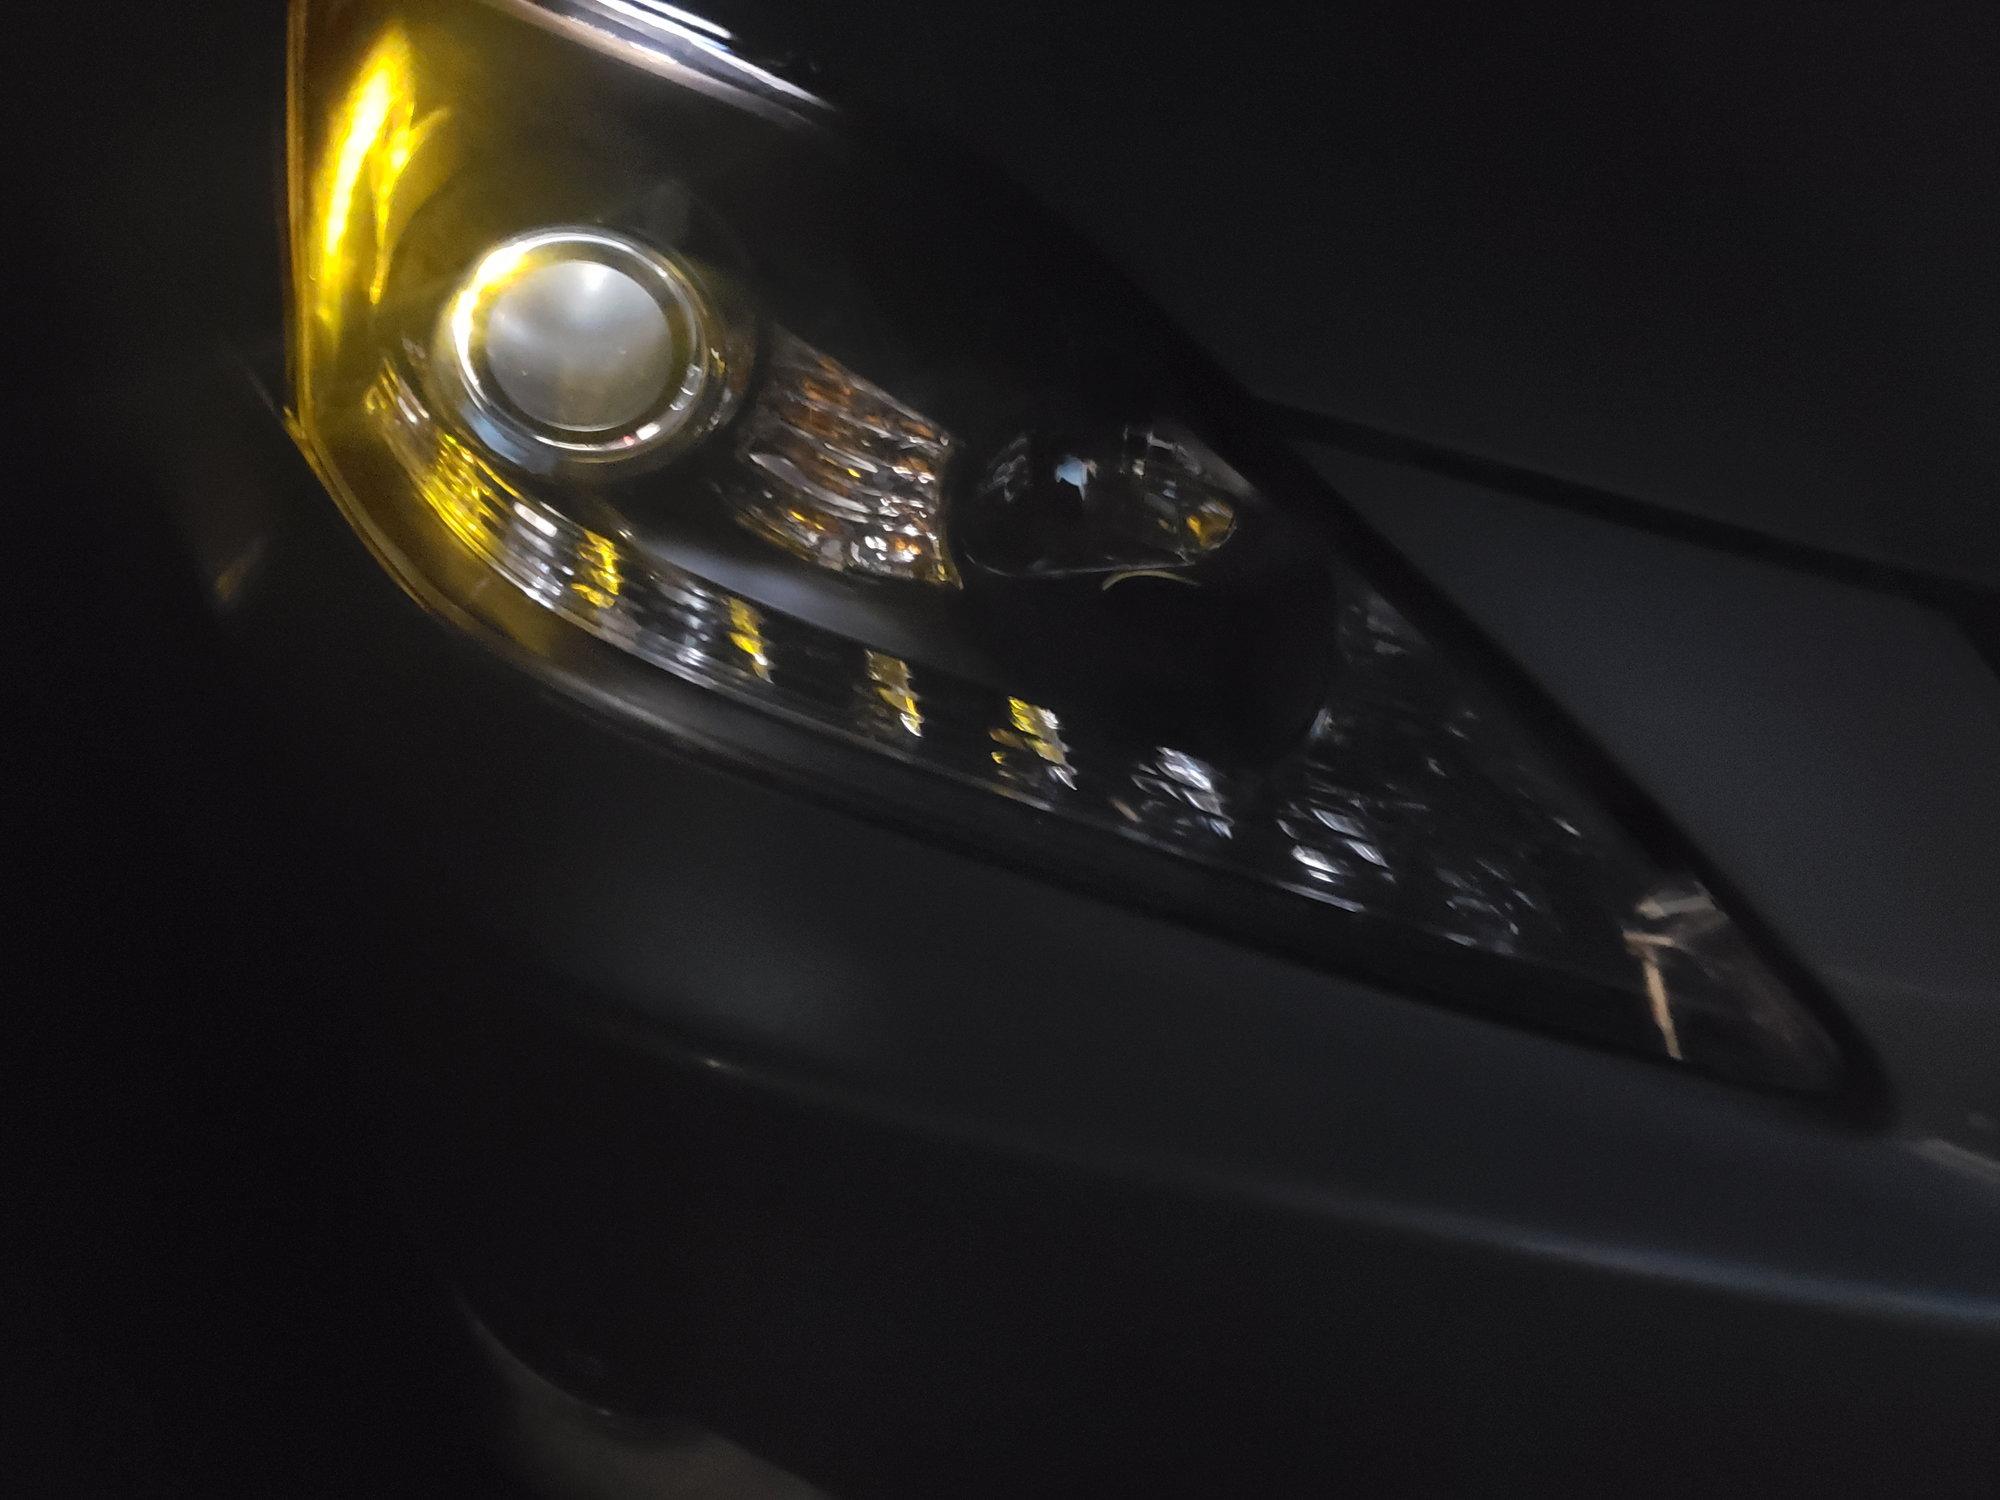 Aftermarket headlights DRL light problem - ClubLexus - Lexus